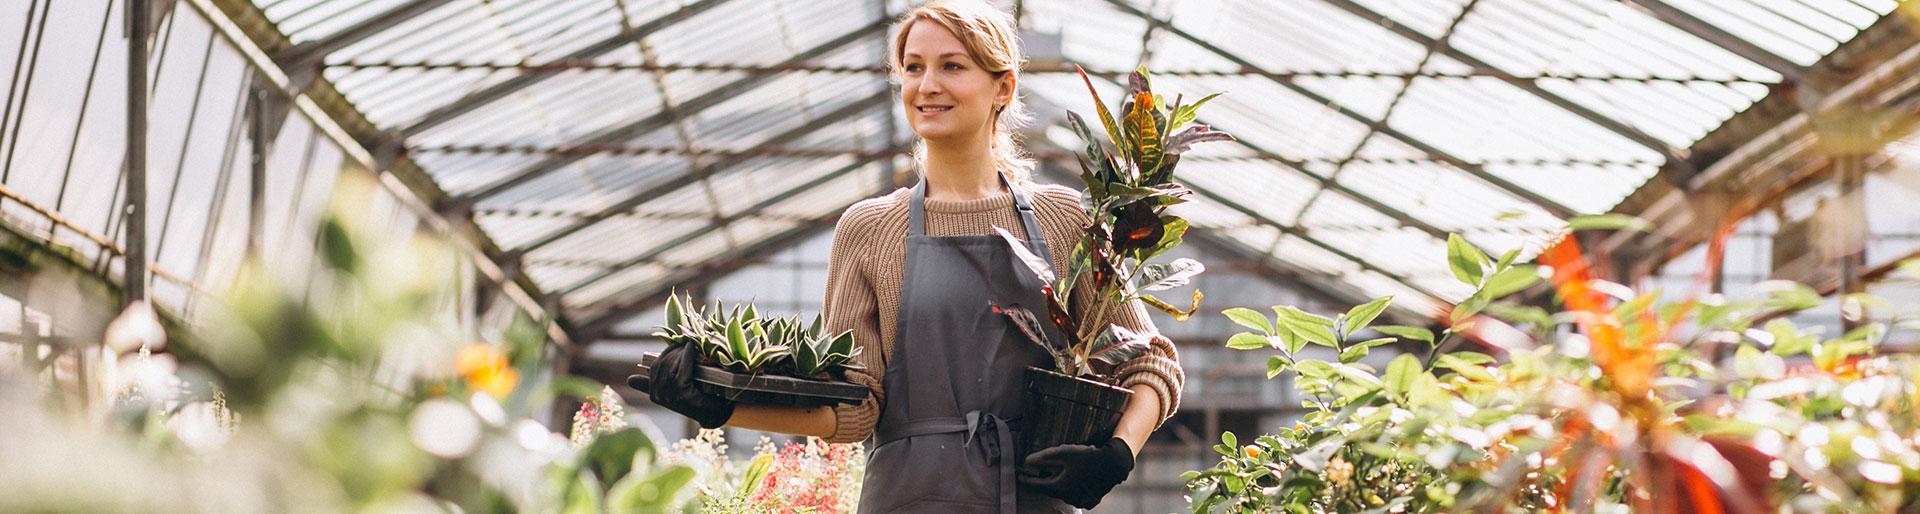 BP Fleuriste - femme fleuriste